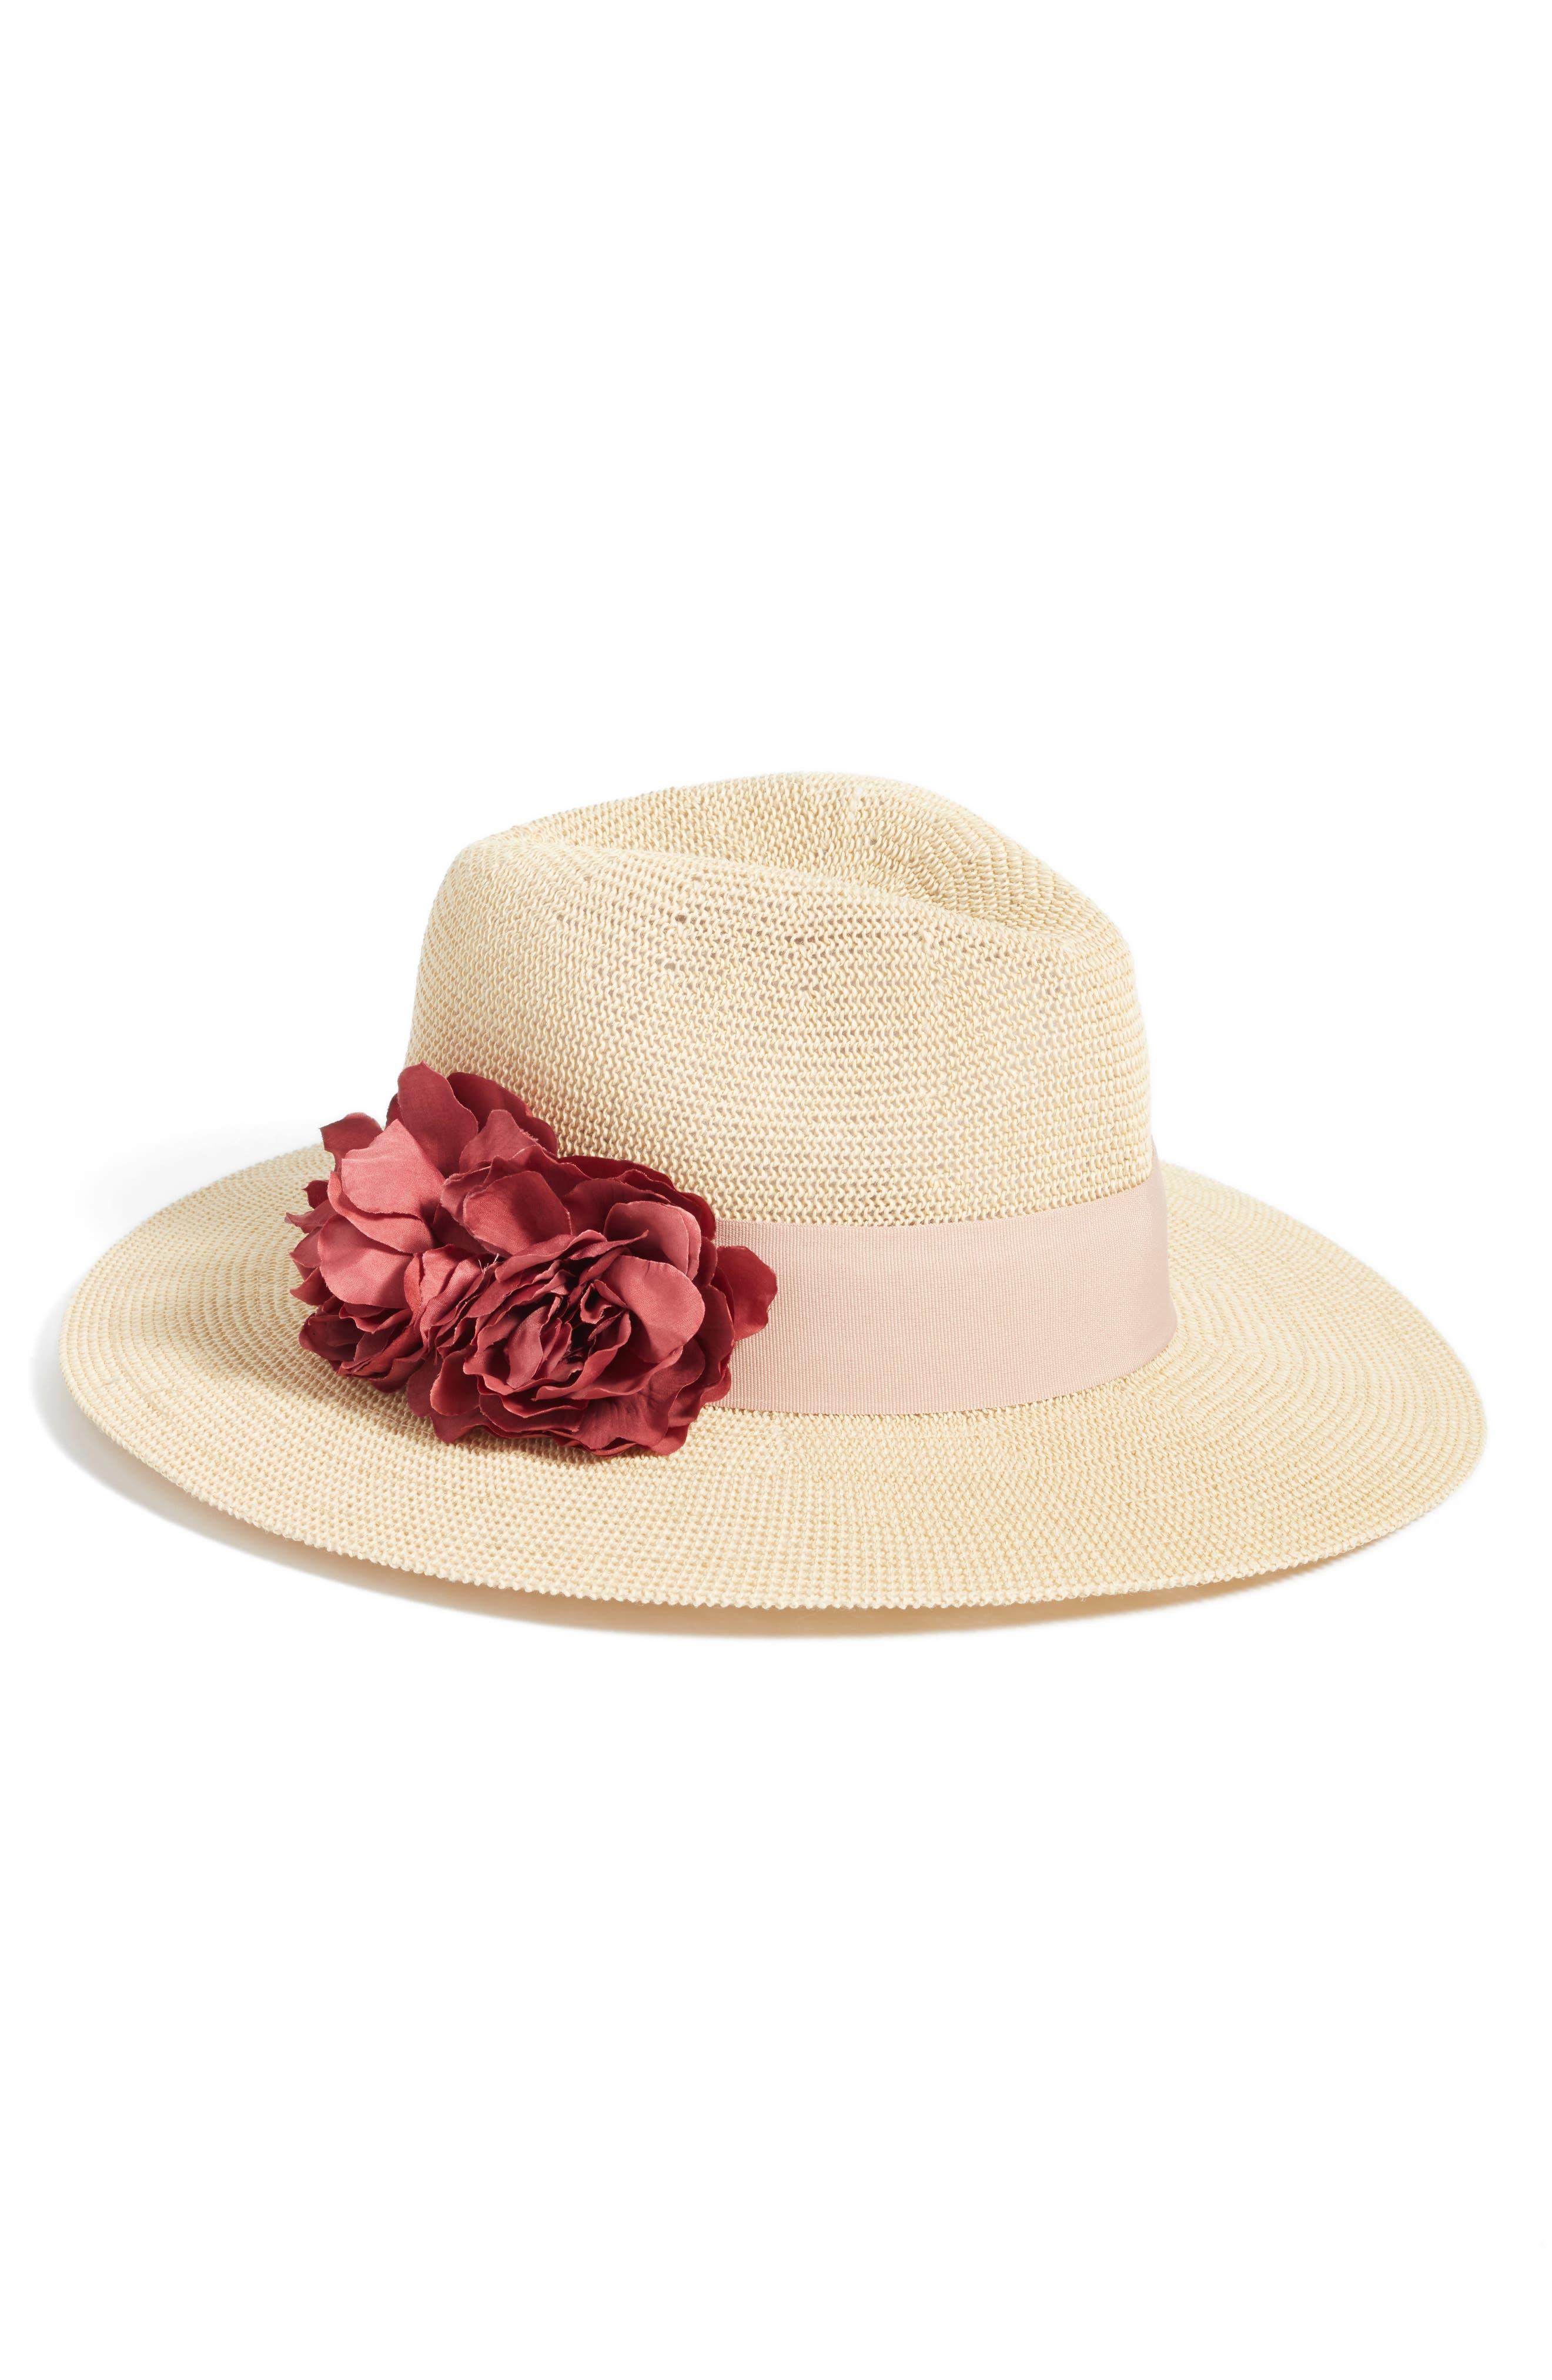 Floral Trim Straw Panama Hat,                         Main,                         color, 250